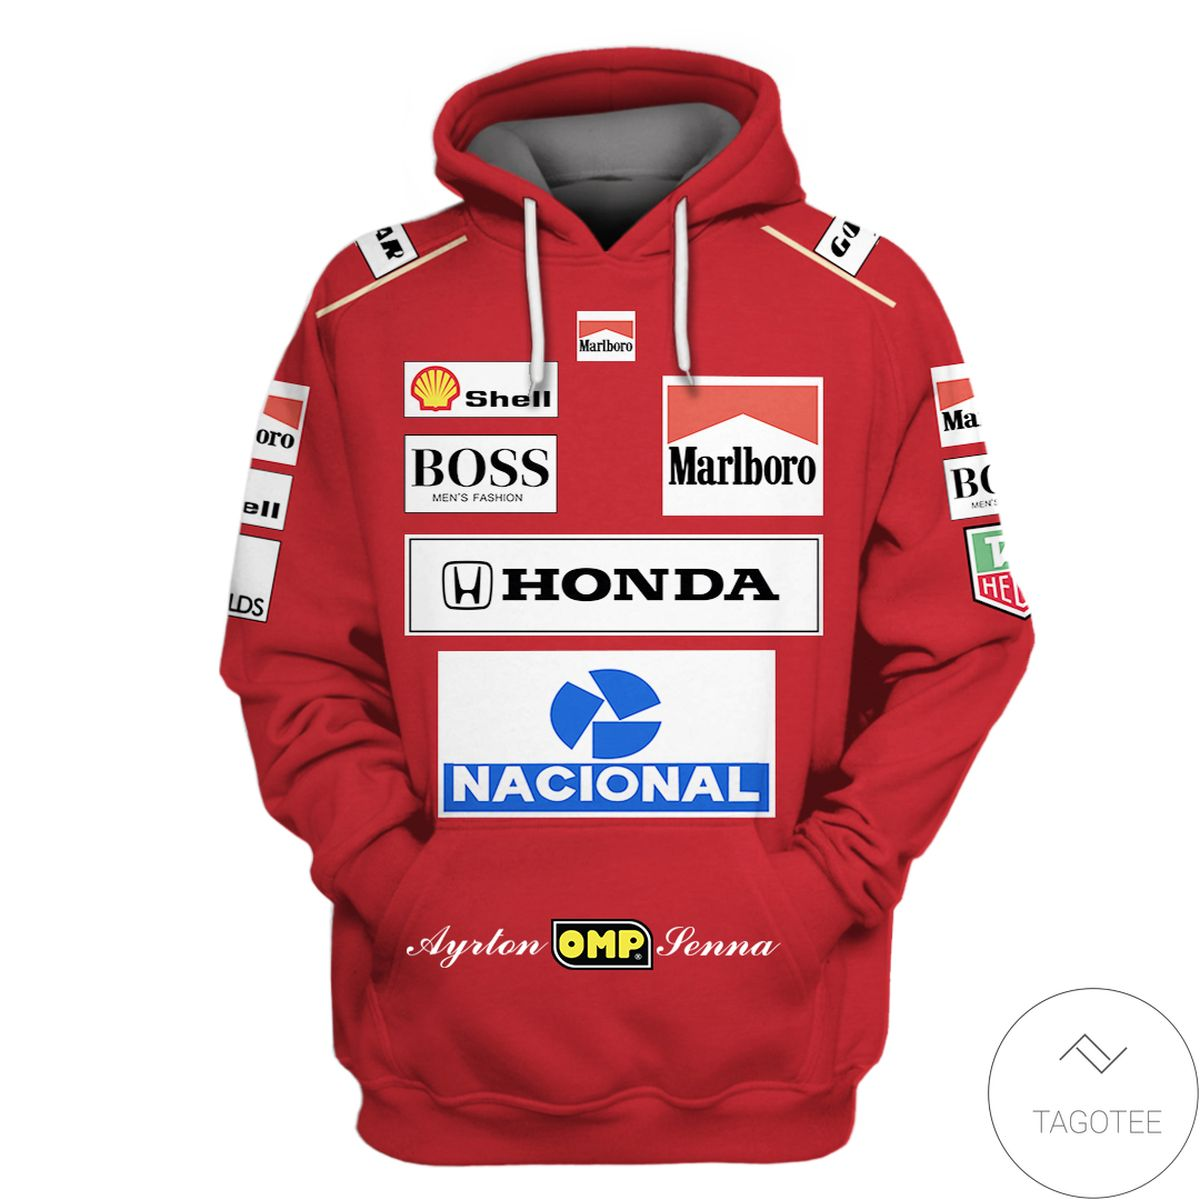 Ayrton Senna Branded Unisex 3d Hoodie